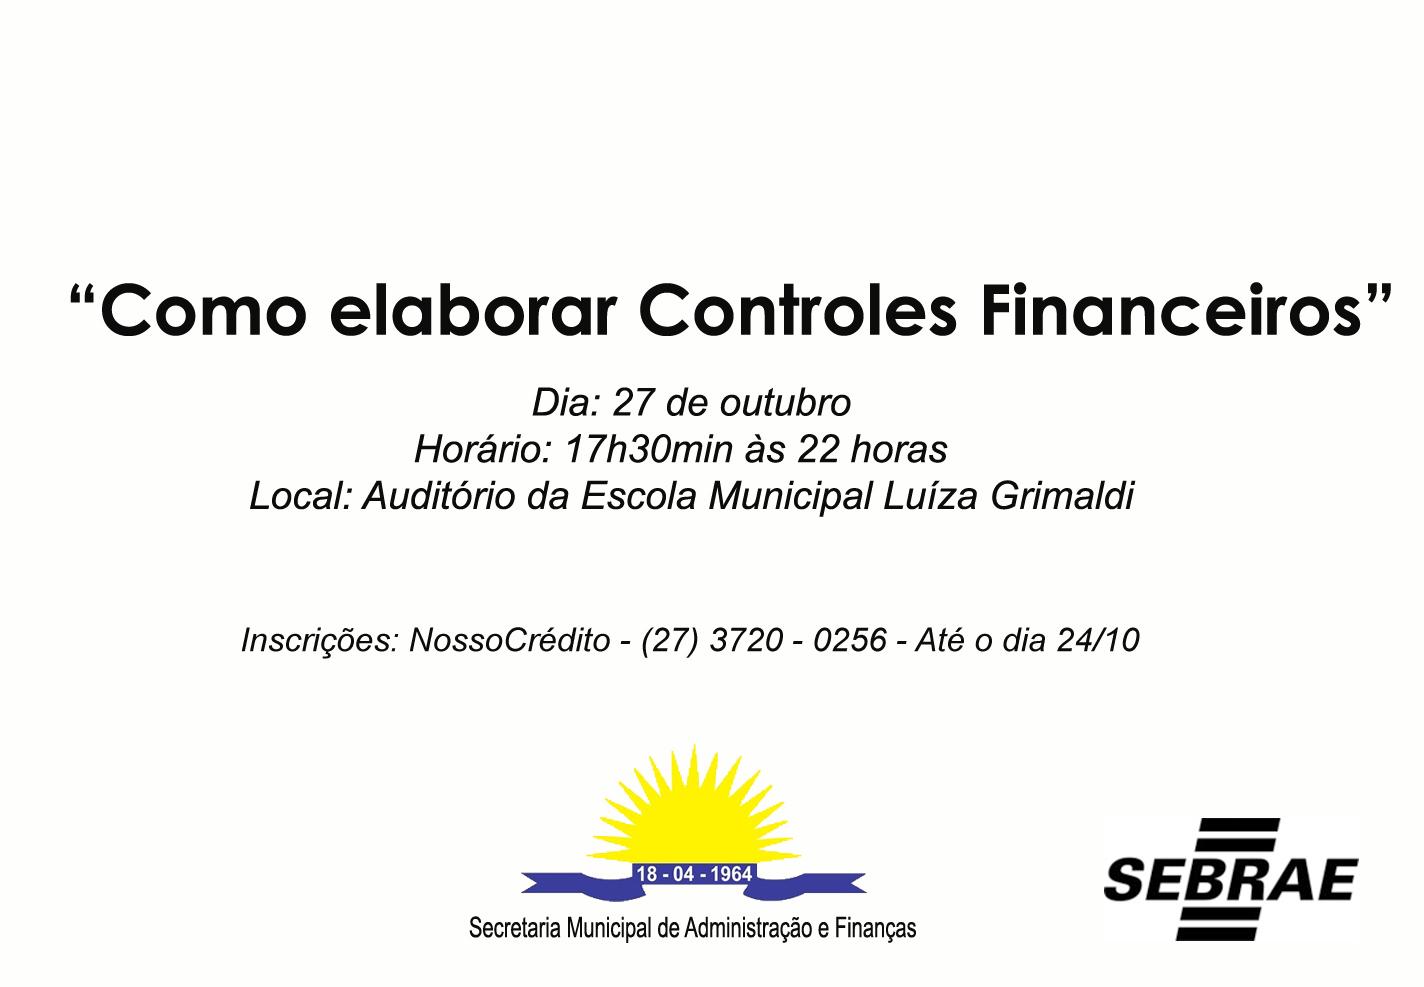 Curso vai discutir controle financeiro na próxima segunda-feira (27)